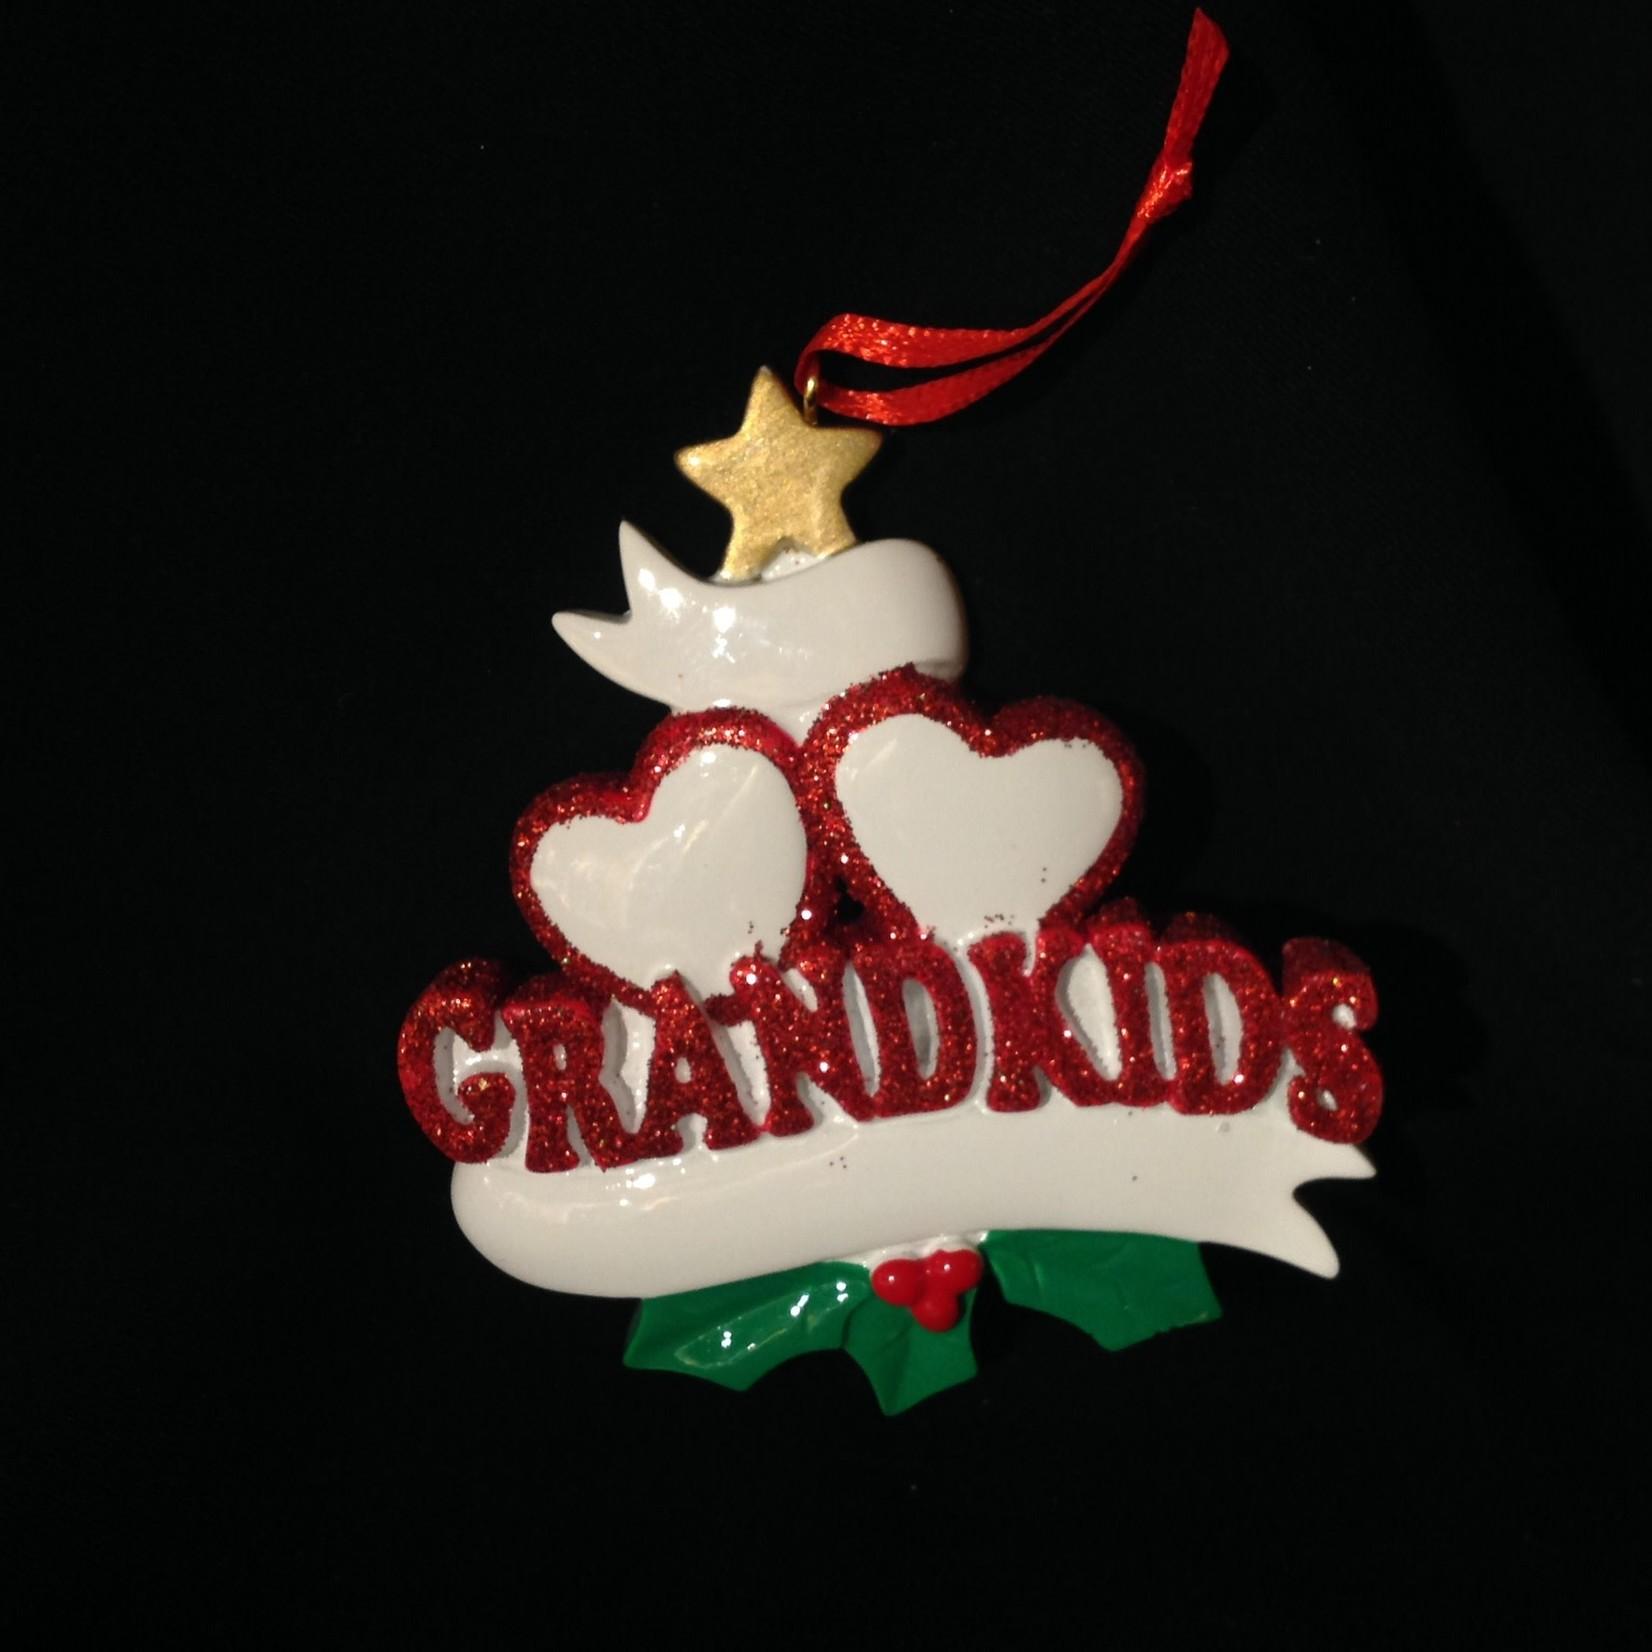 Grandkid Hearts Orn - 2